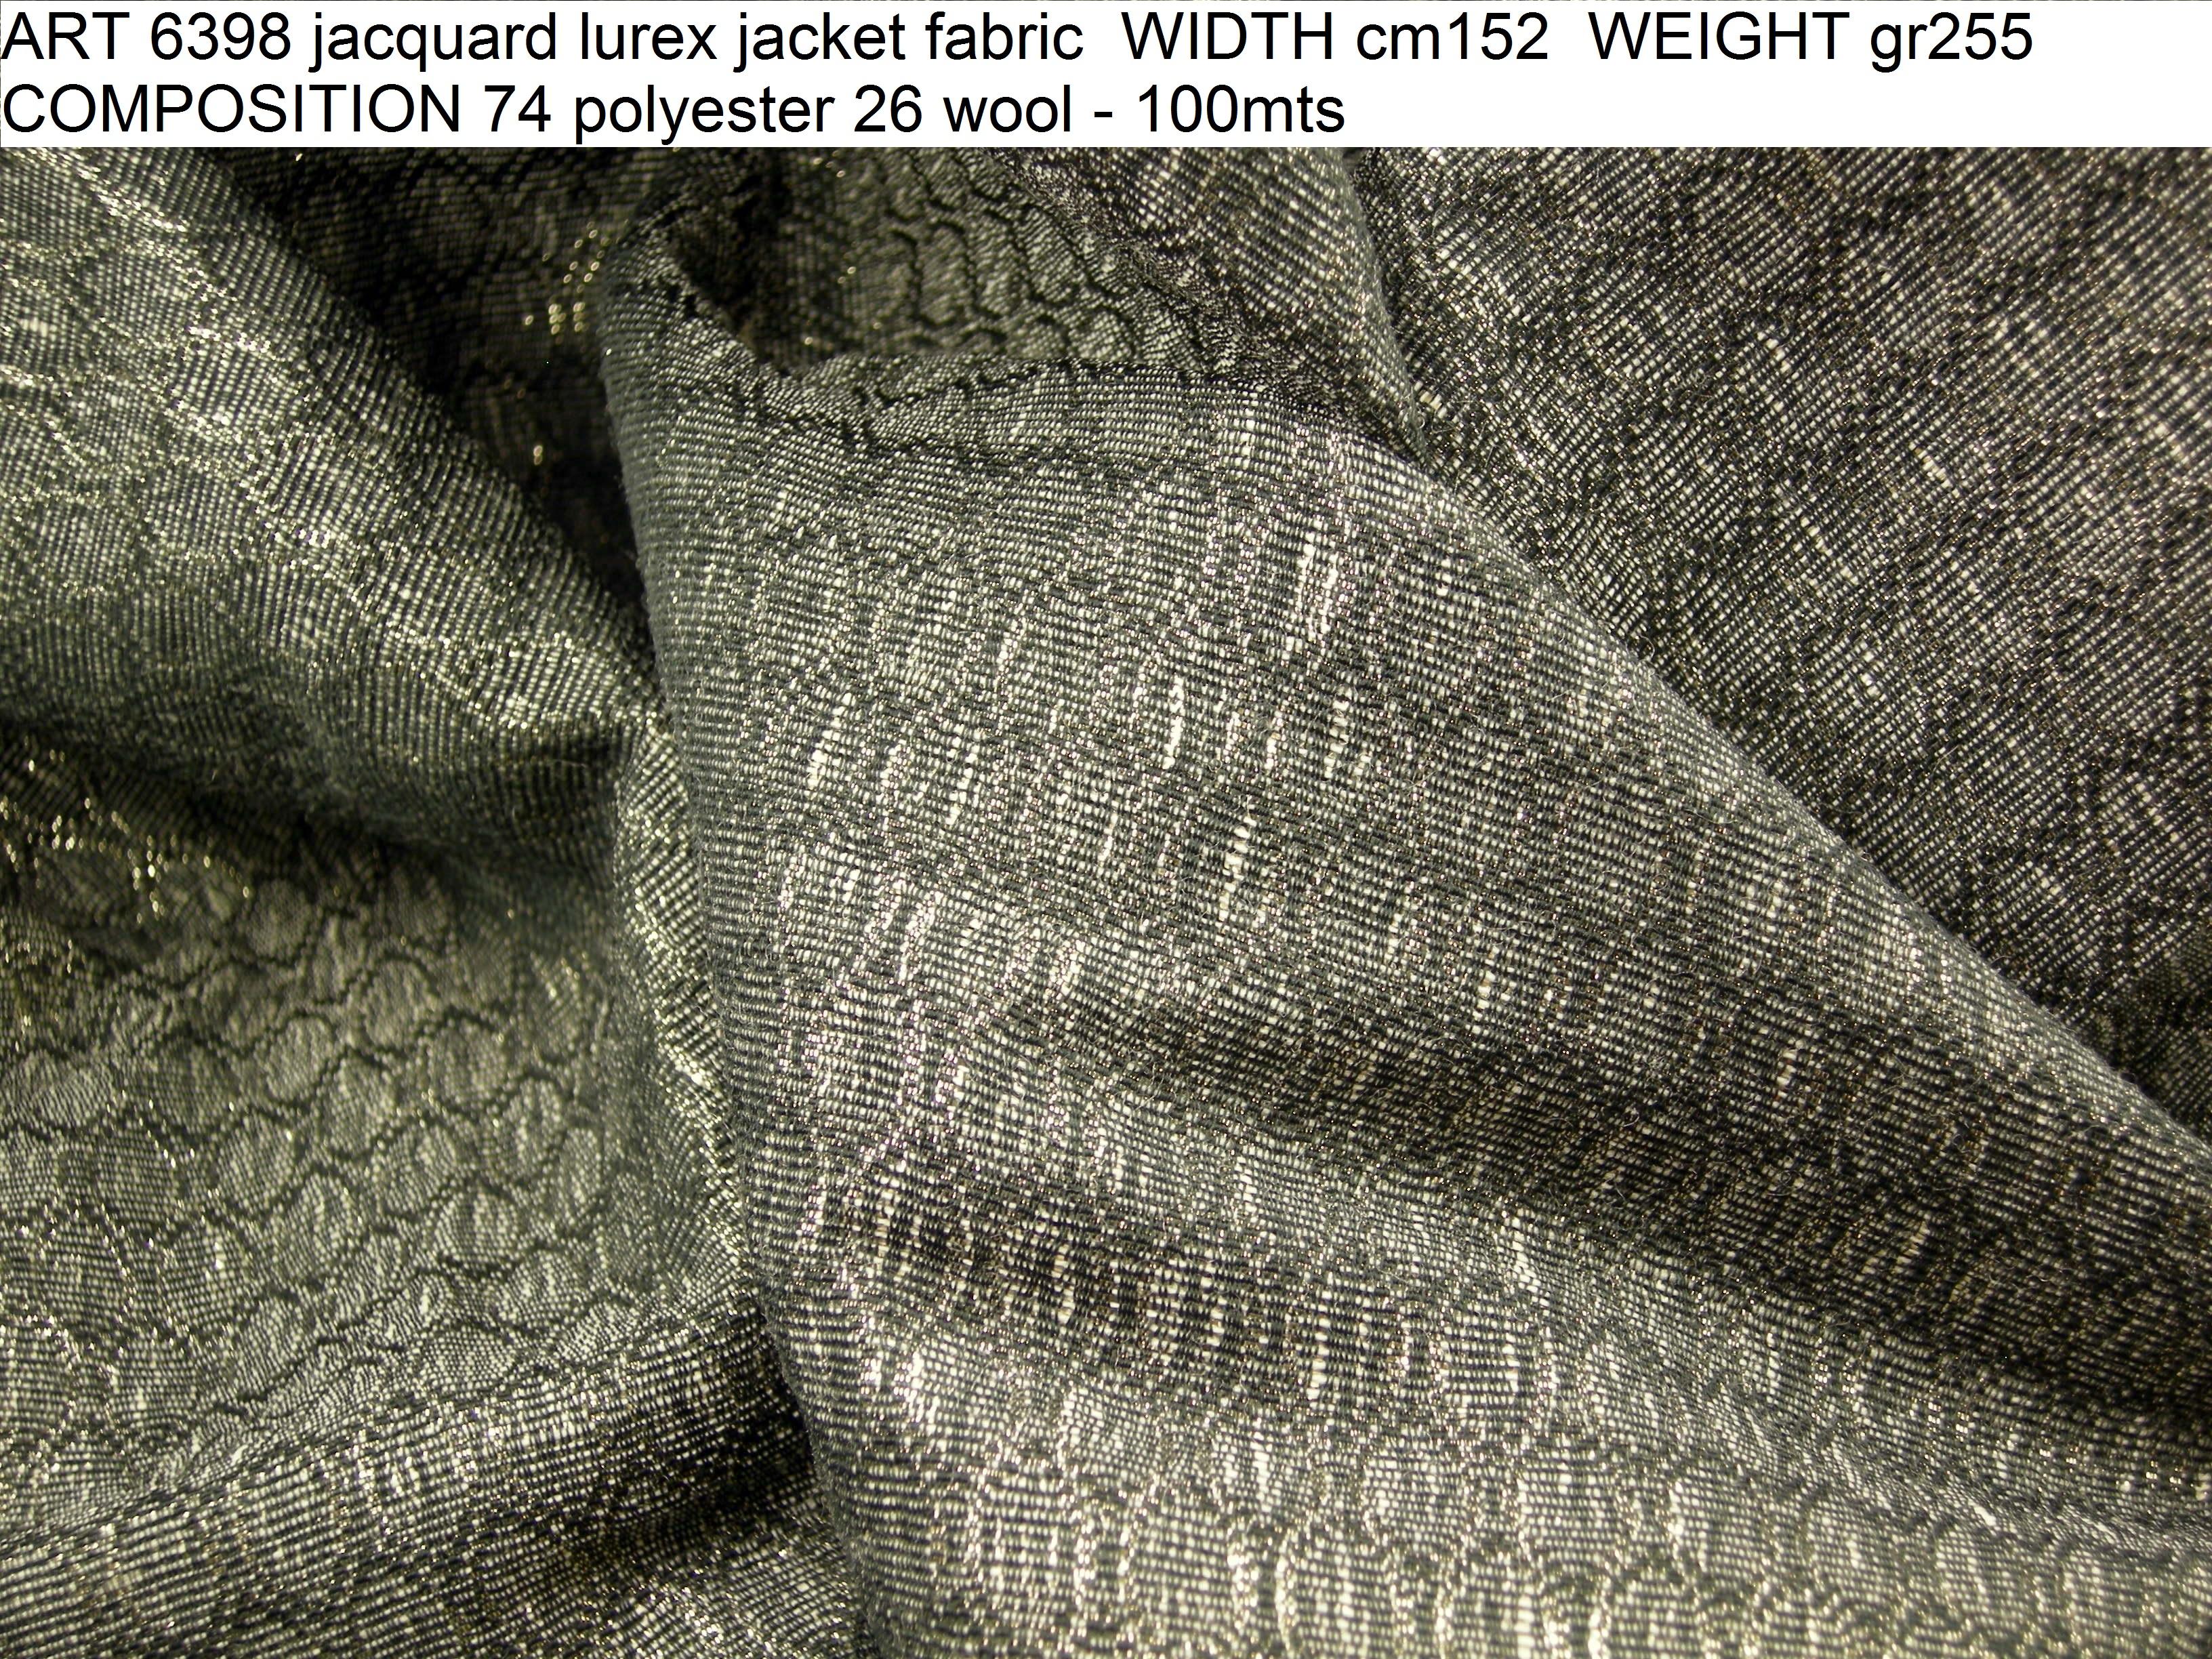 ART 6398 jacquard lurex jacket fabric WIDTH cm152 WEIGHT gr255 COMPOSITION 74 polyester 26 wool - 100mts